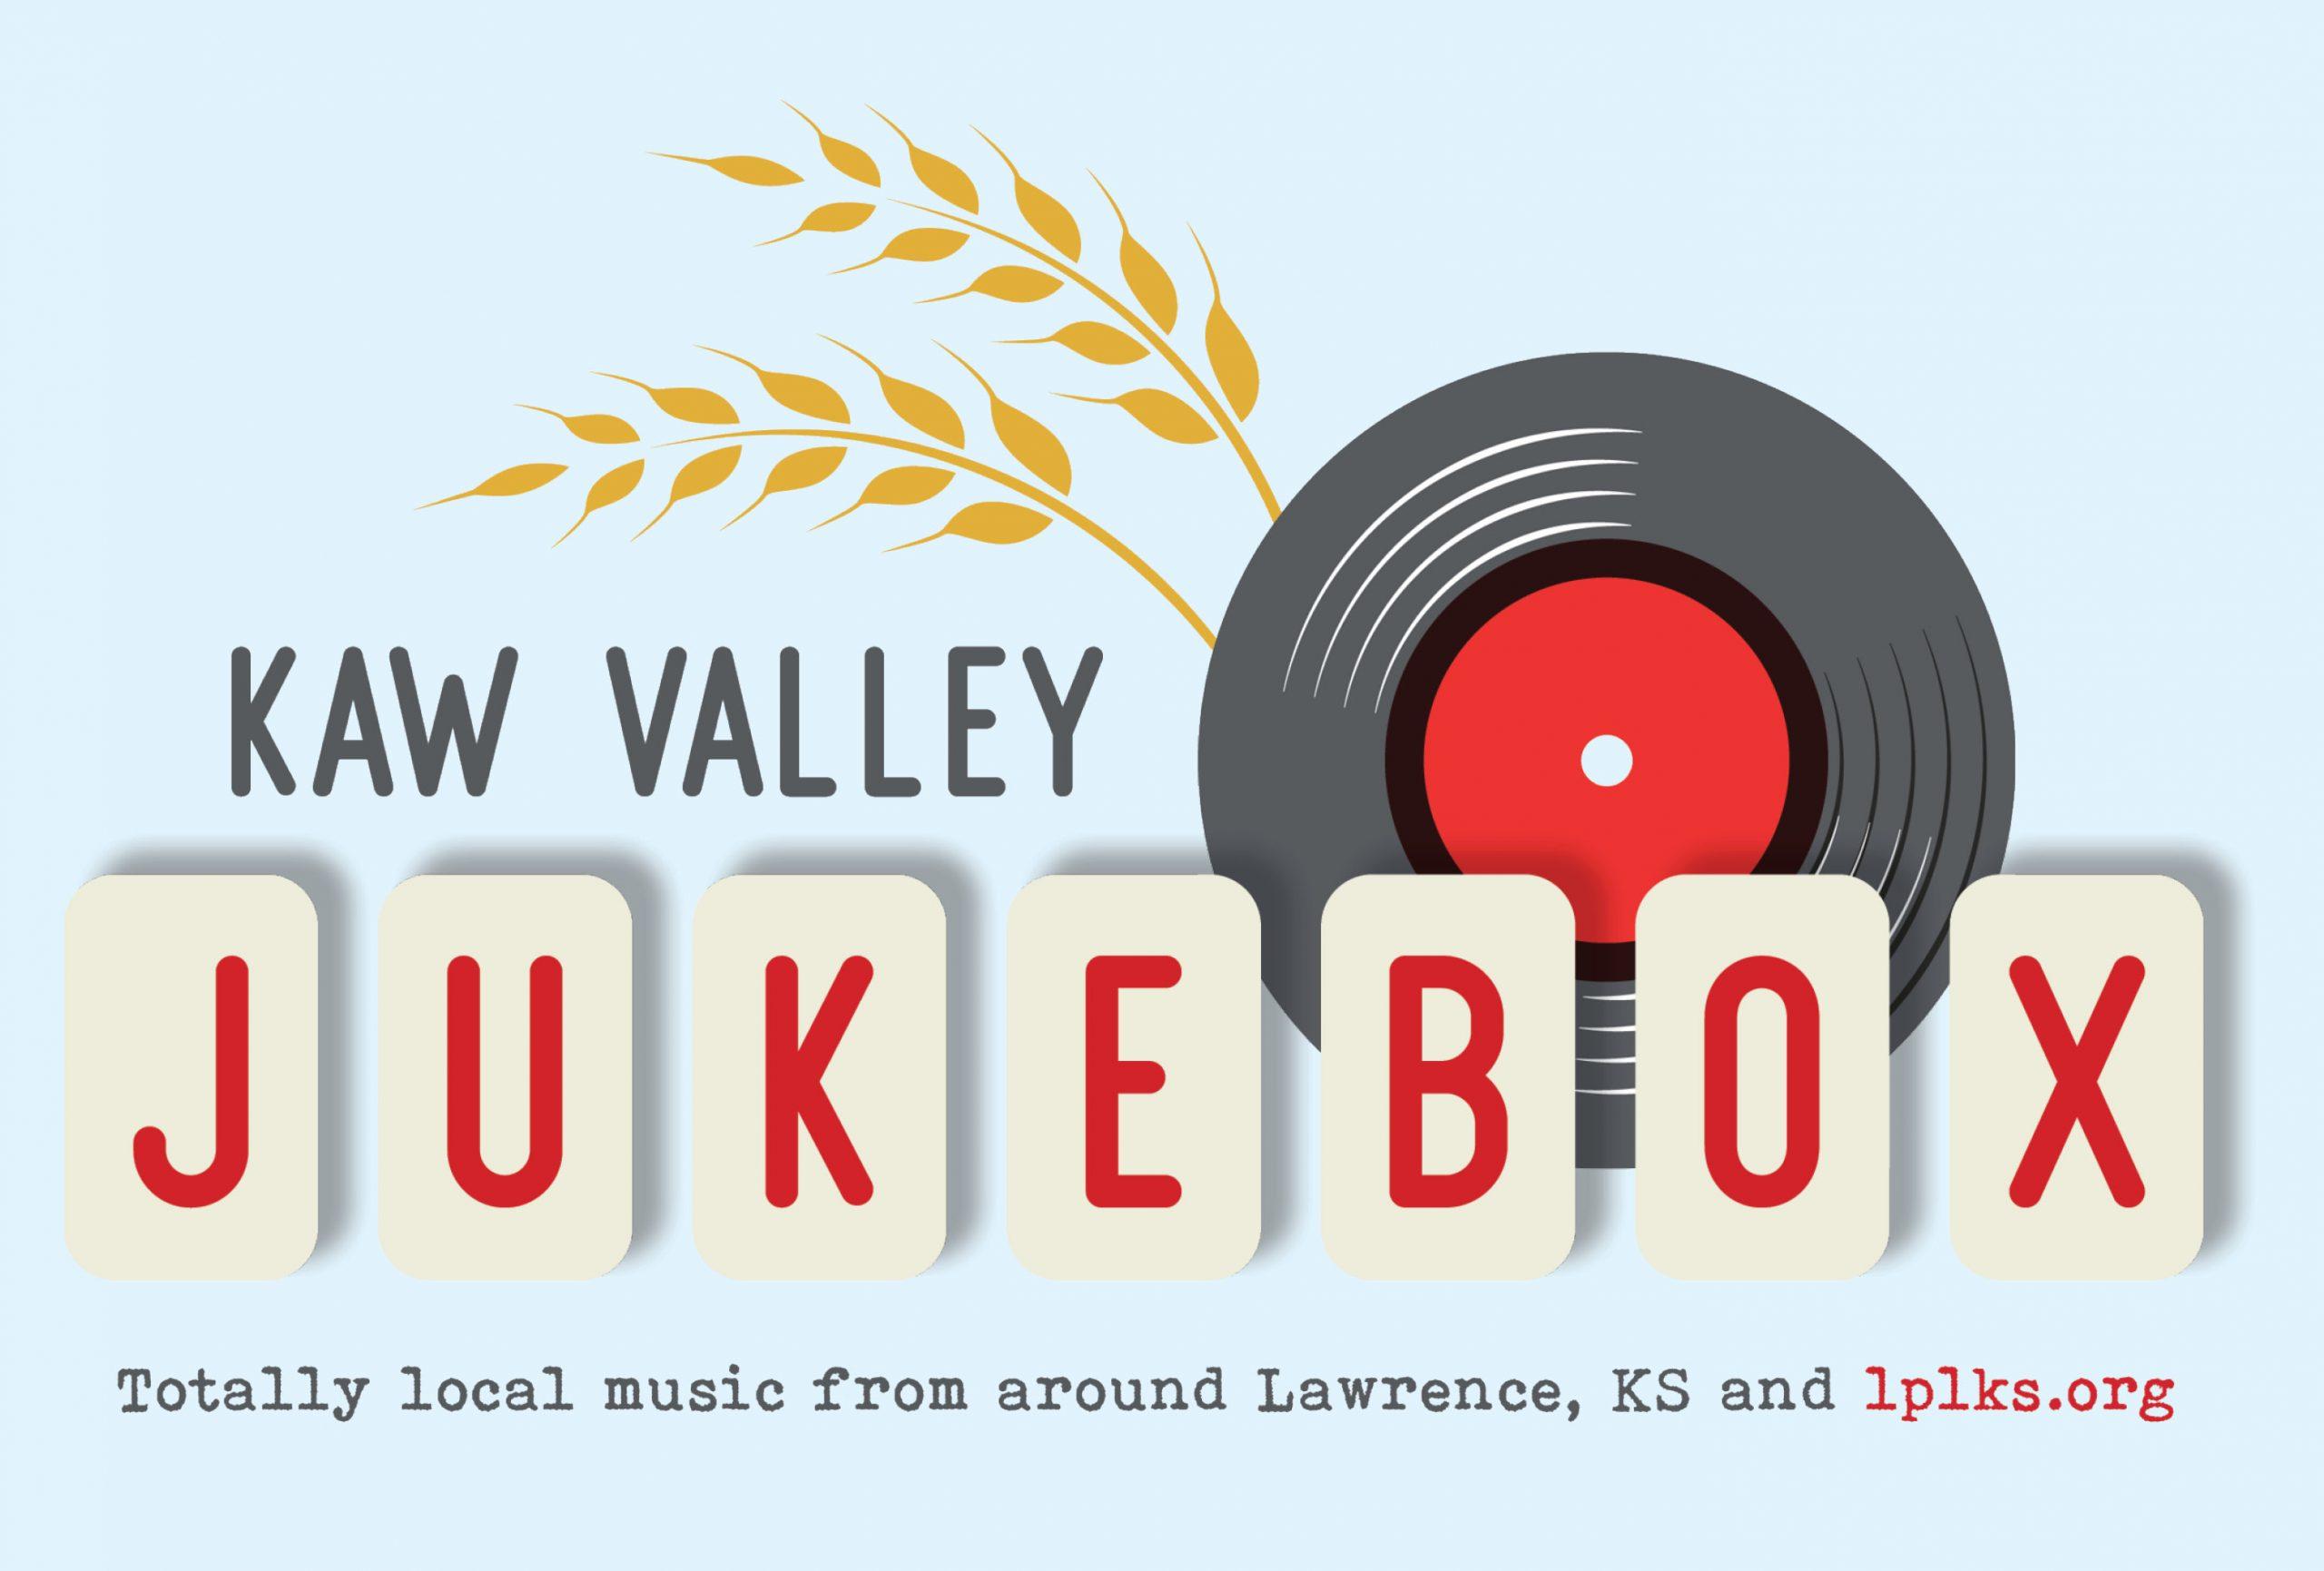 2020 3-4 Kaw Valley Jukebox webslider